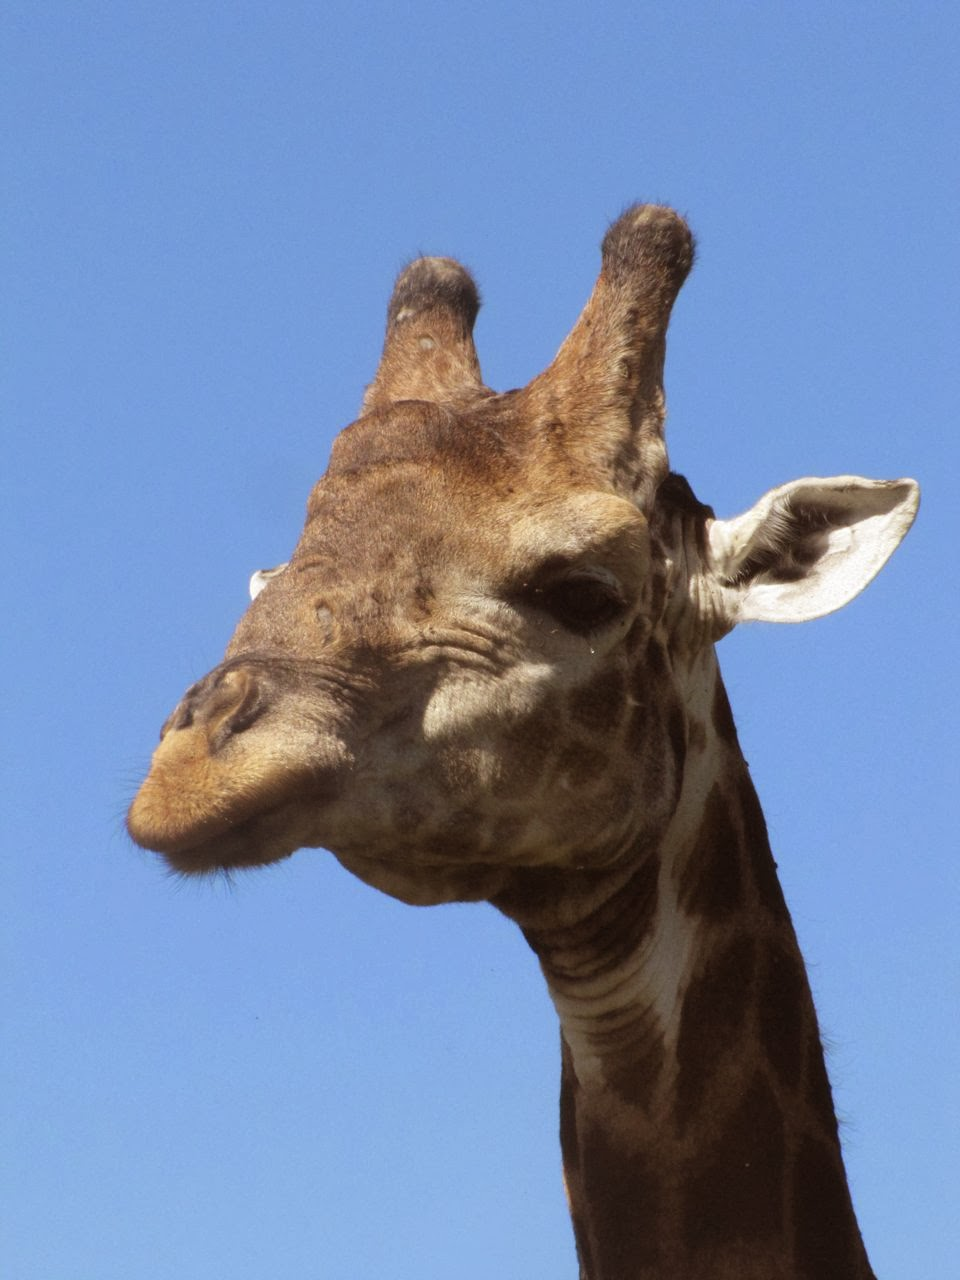 Giraffe Profile Image